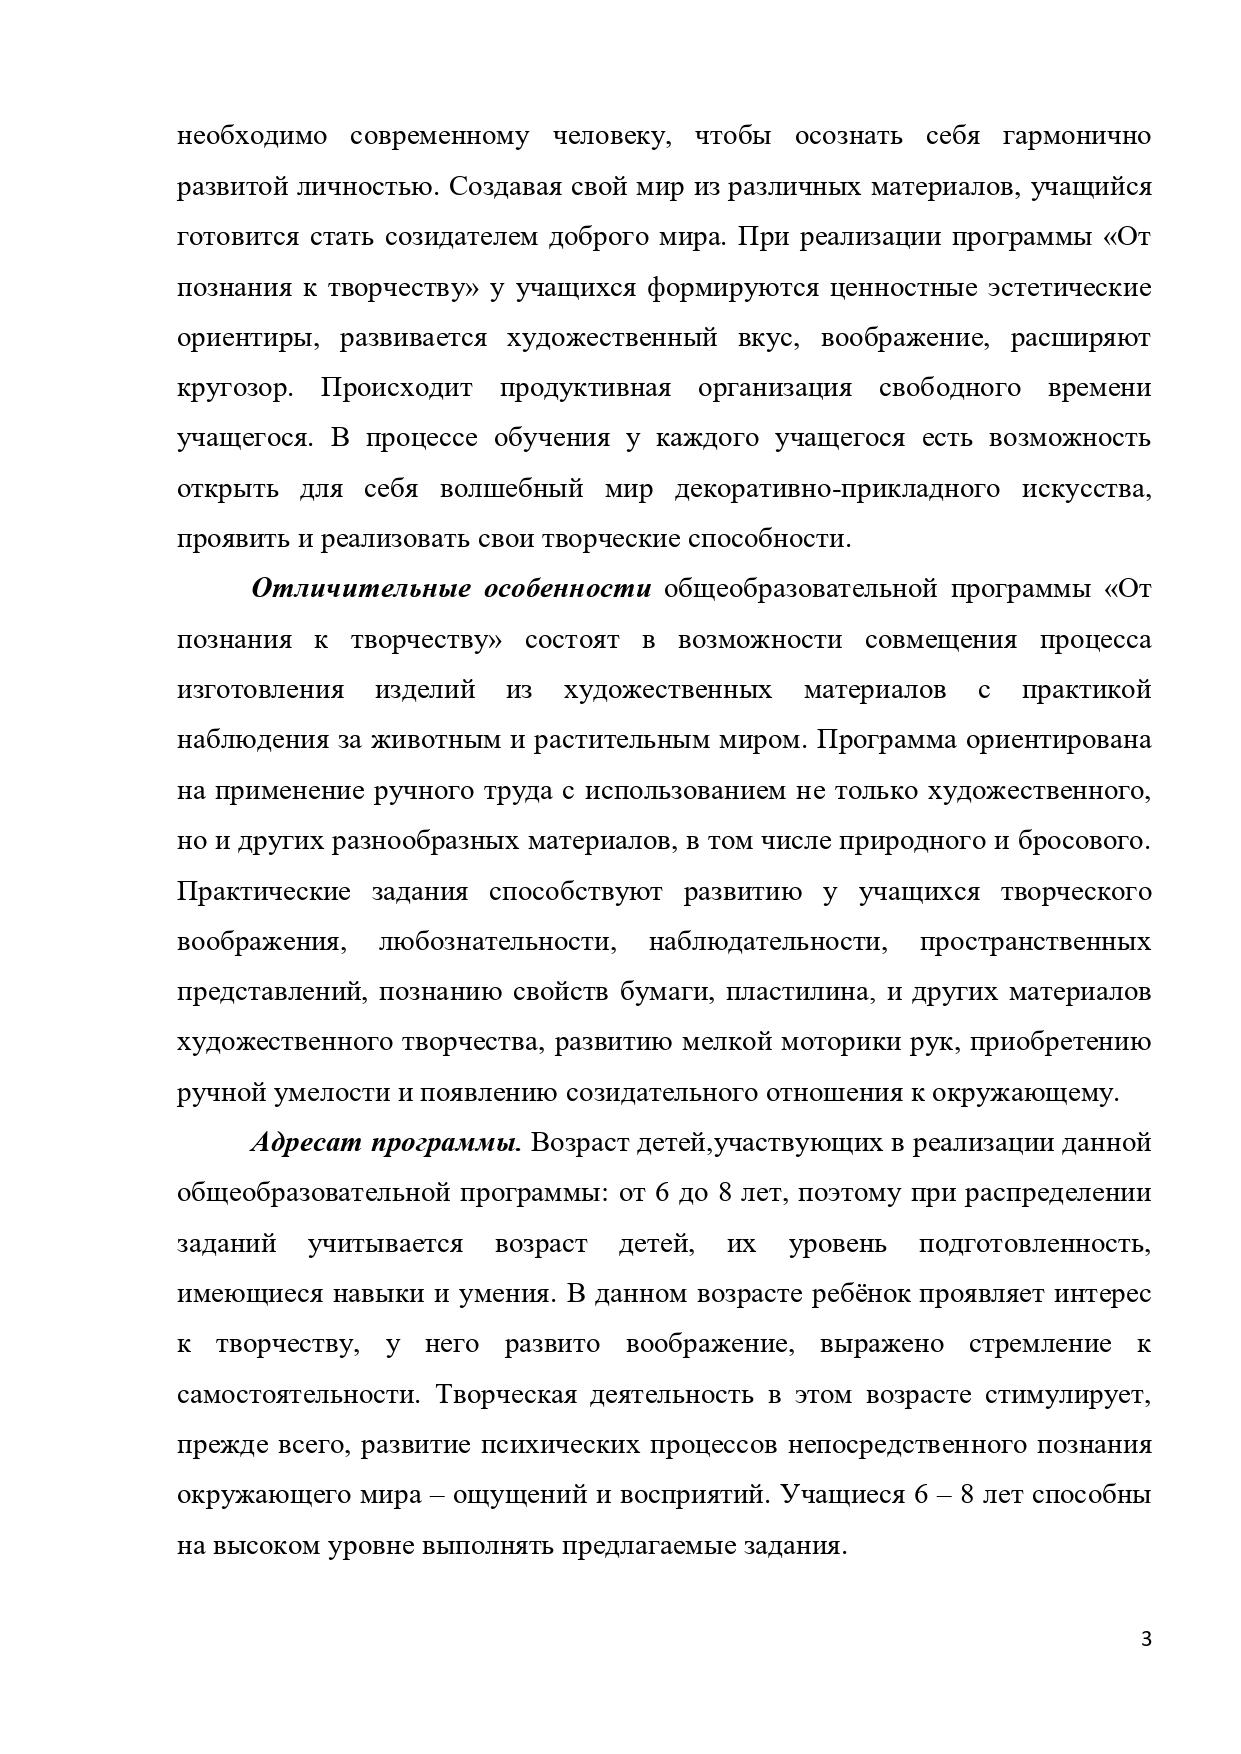 ДООП От познания к творчеству_pages-to-jpg-0003